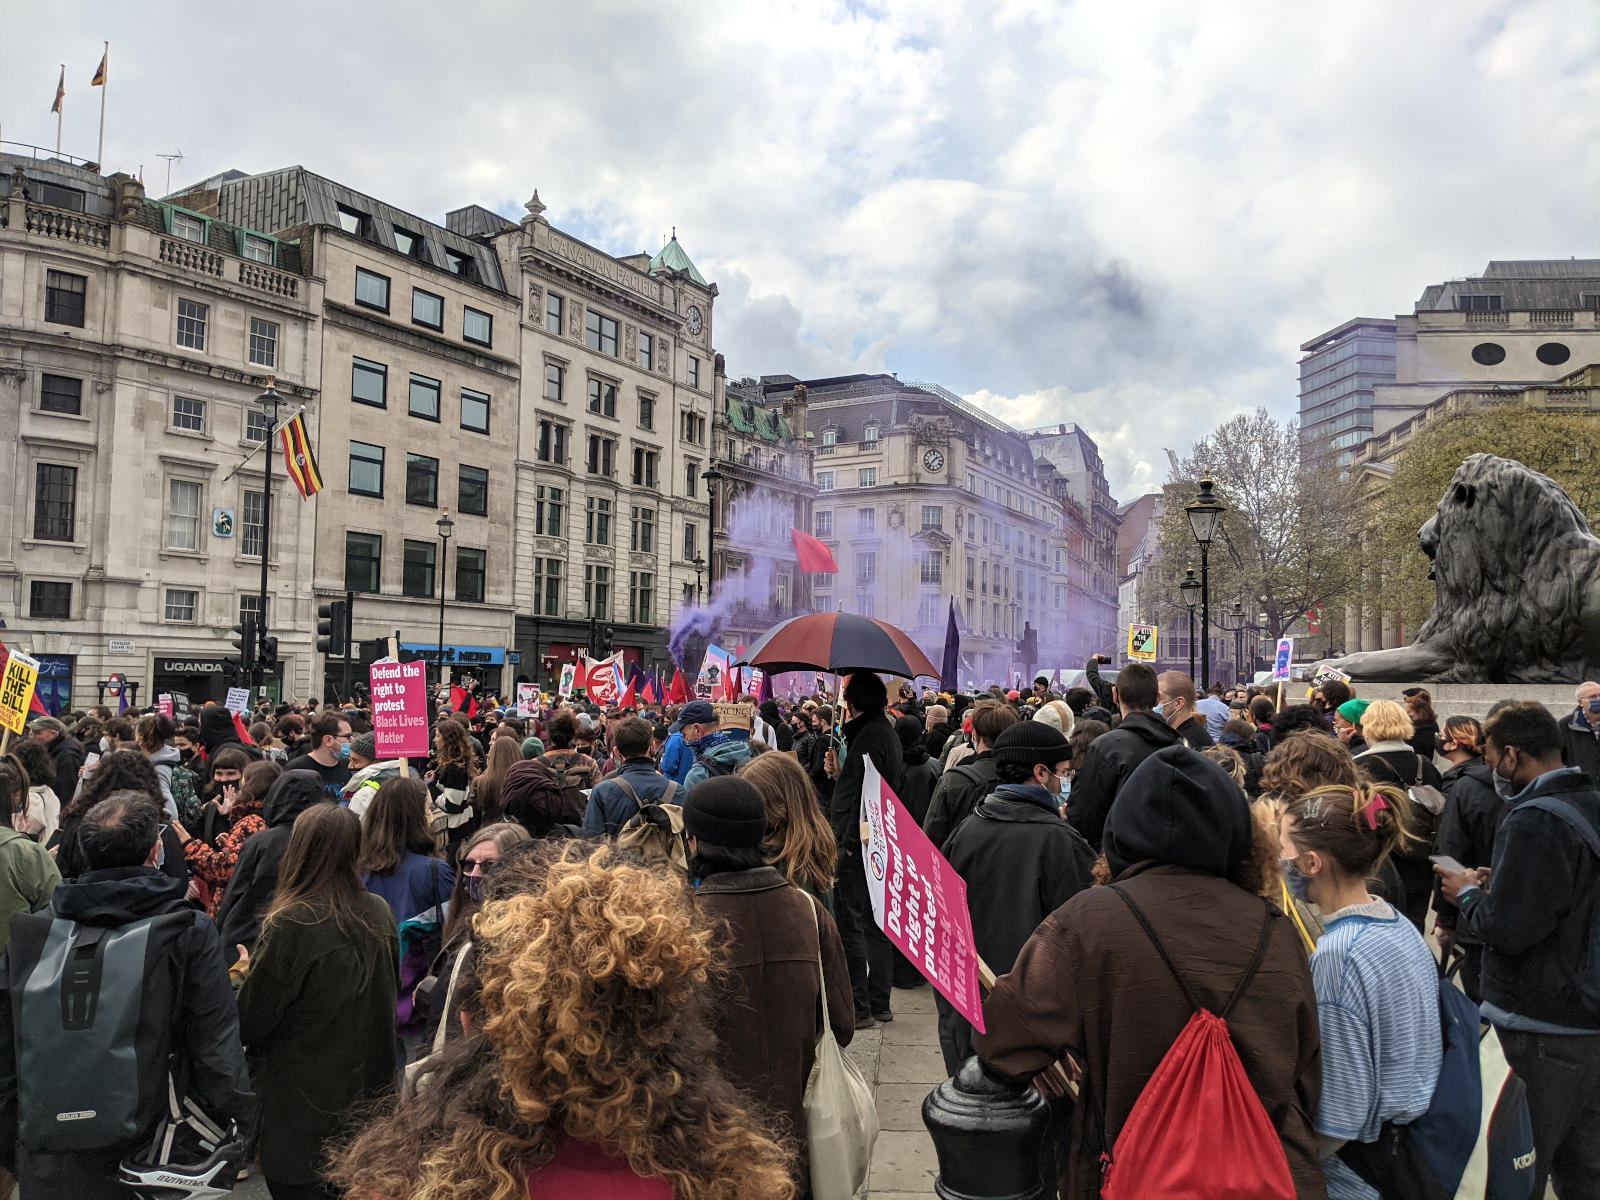 KIll the Bill protest, Trafalgar Square, May Day 2021